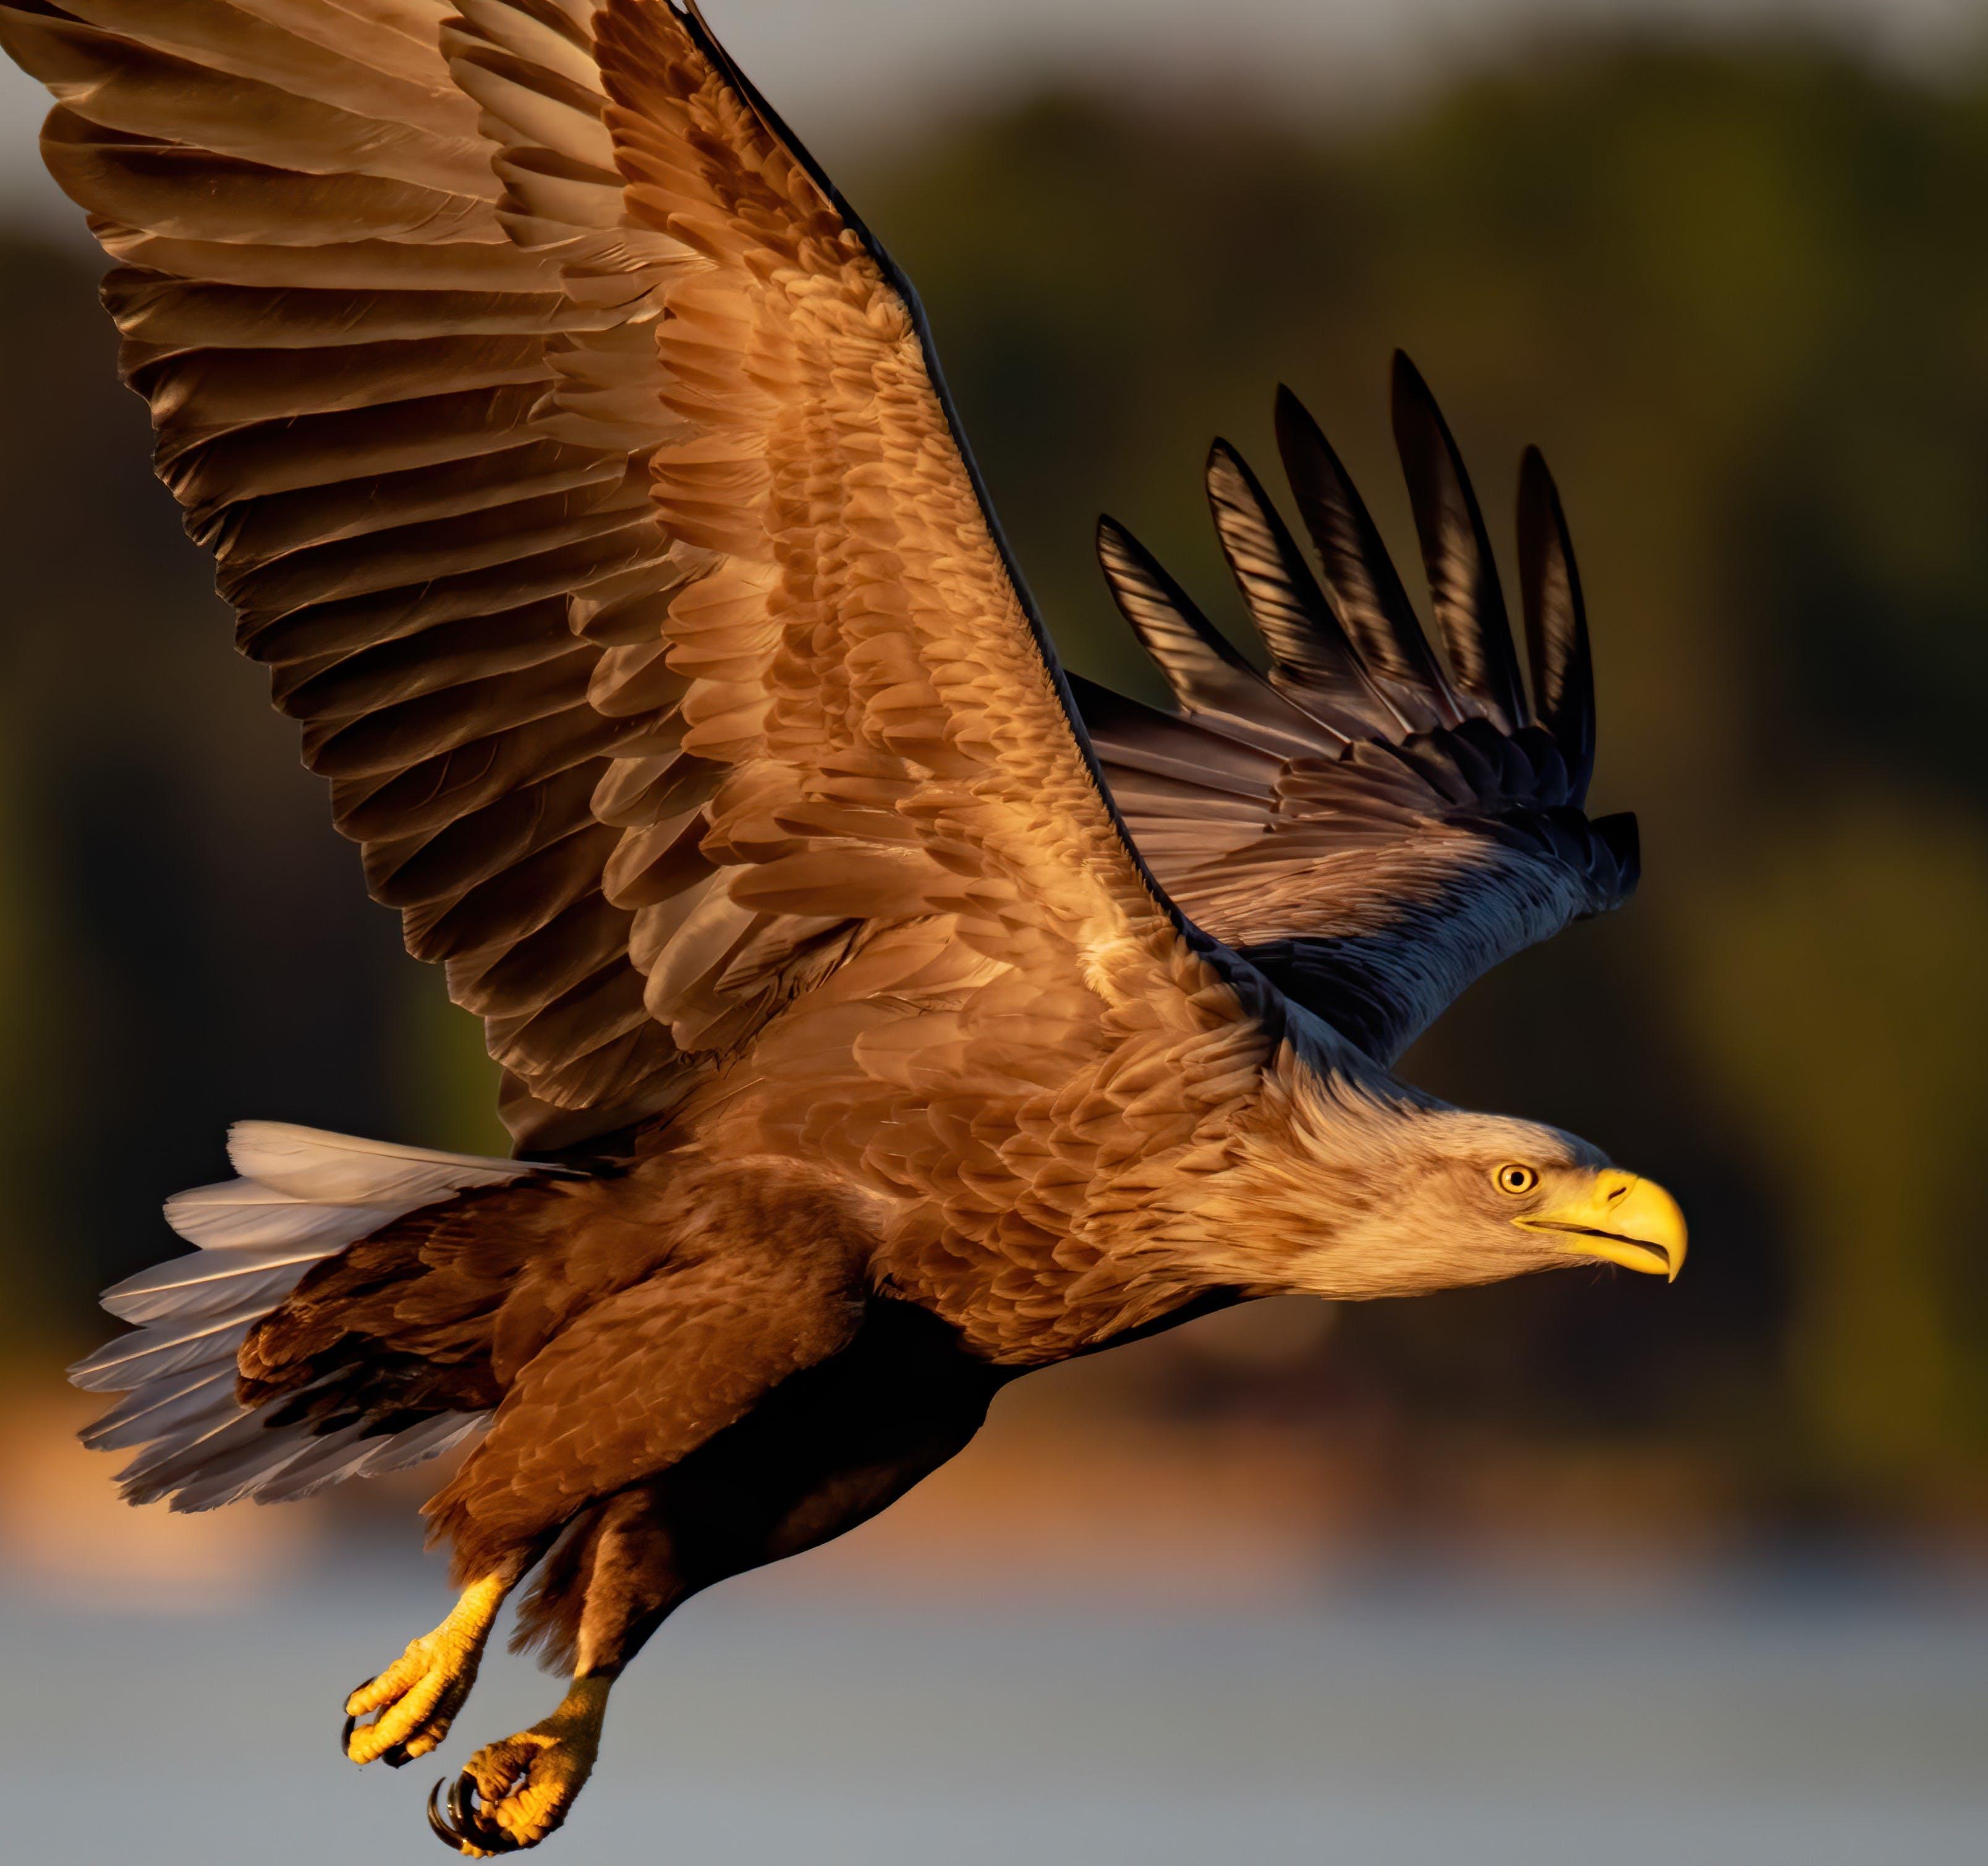 A white tailed sea eagle soars over a river